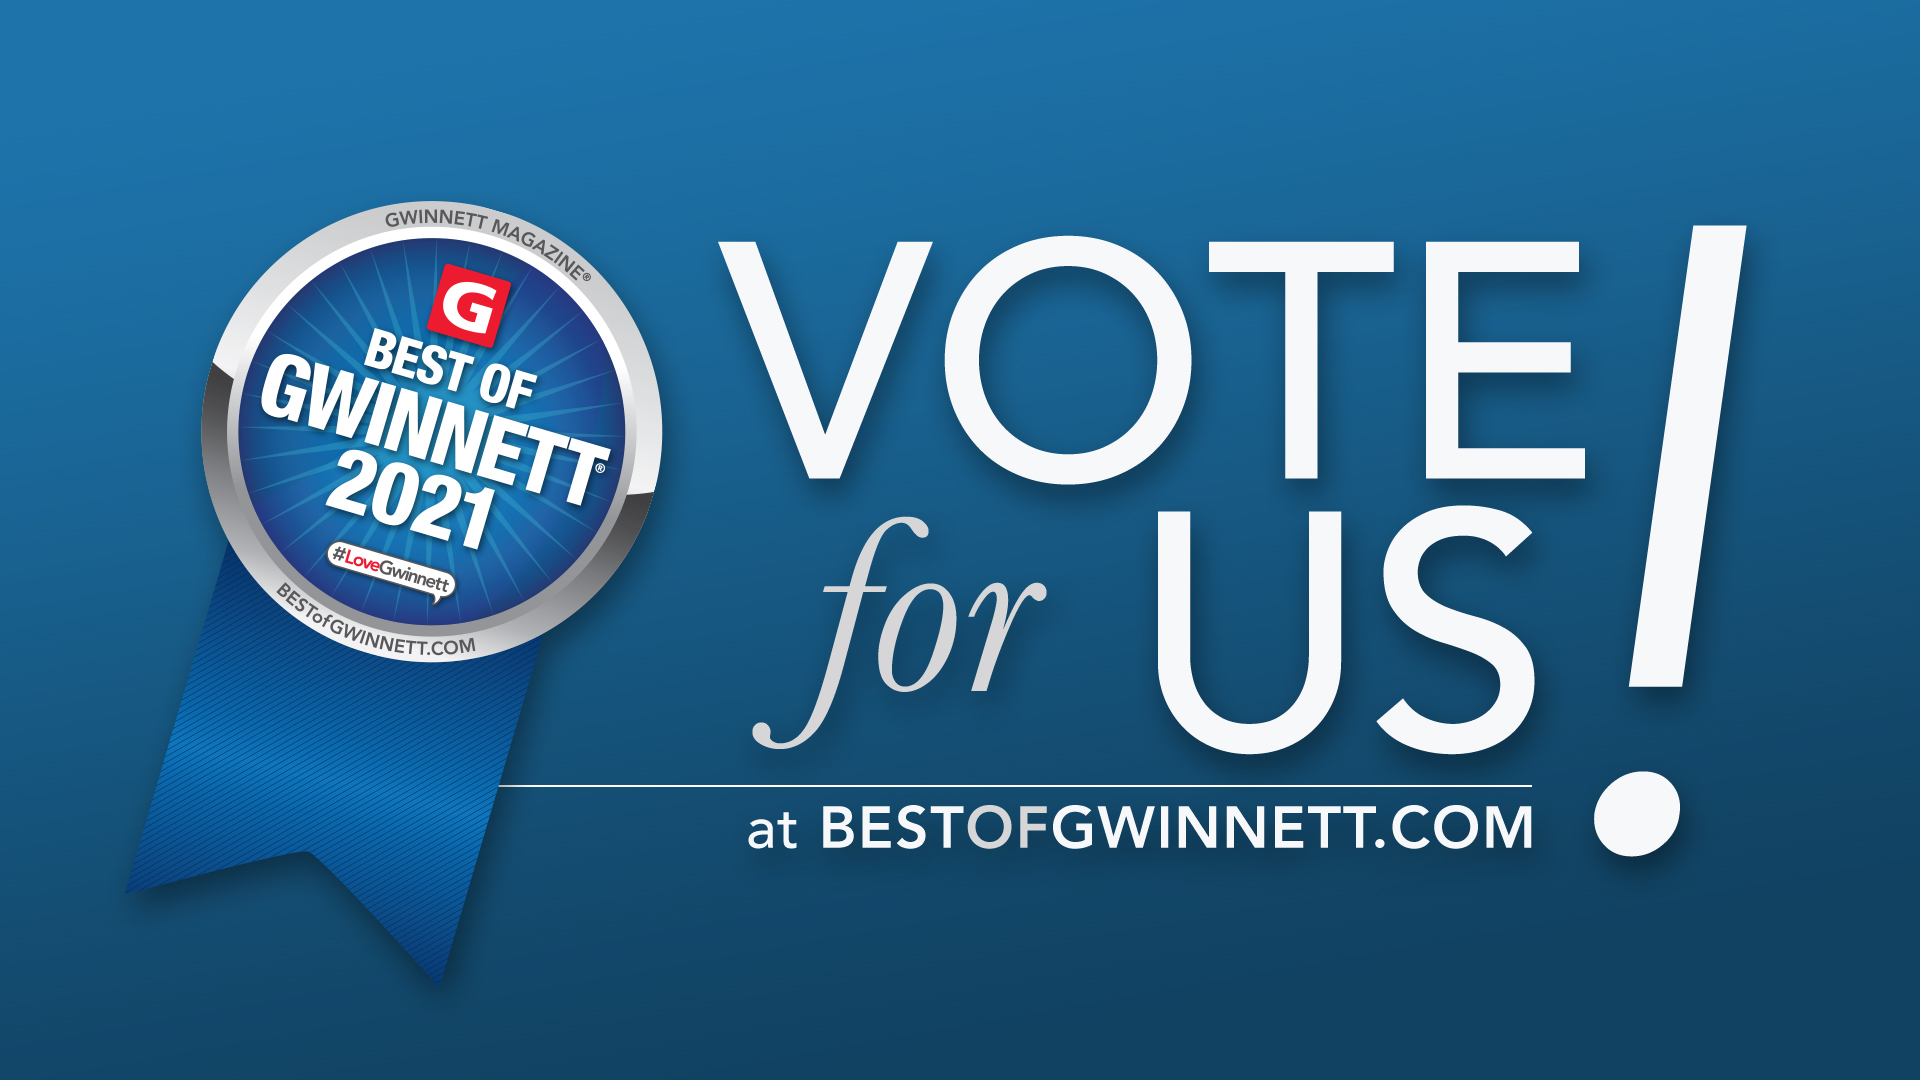 2021 Best of Gwinnett Campaign Kit Facebook